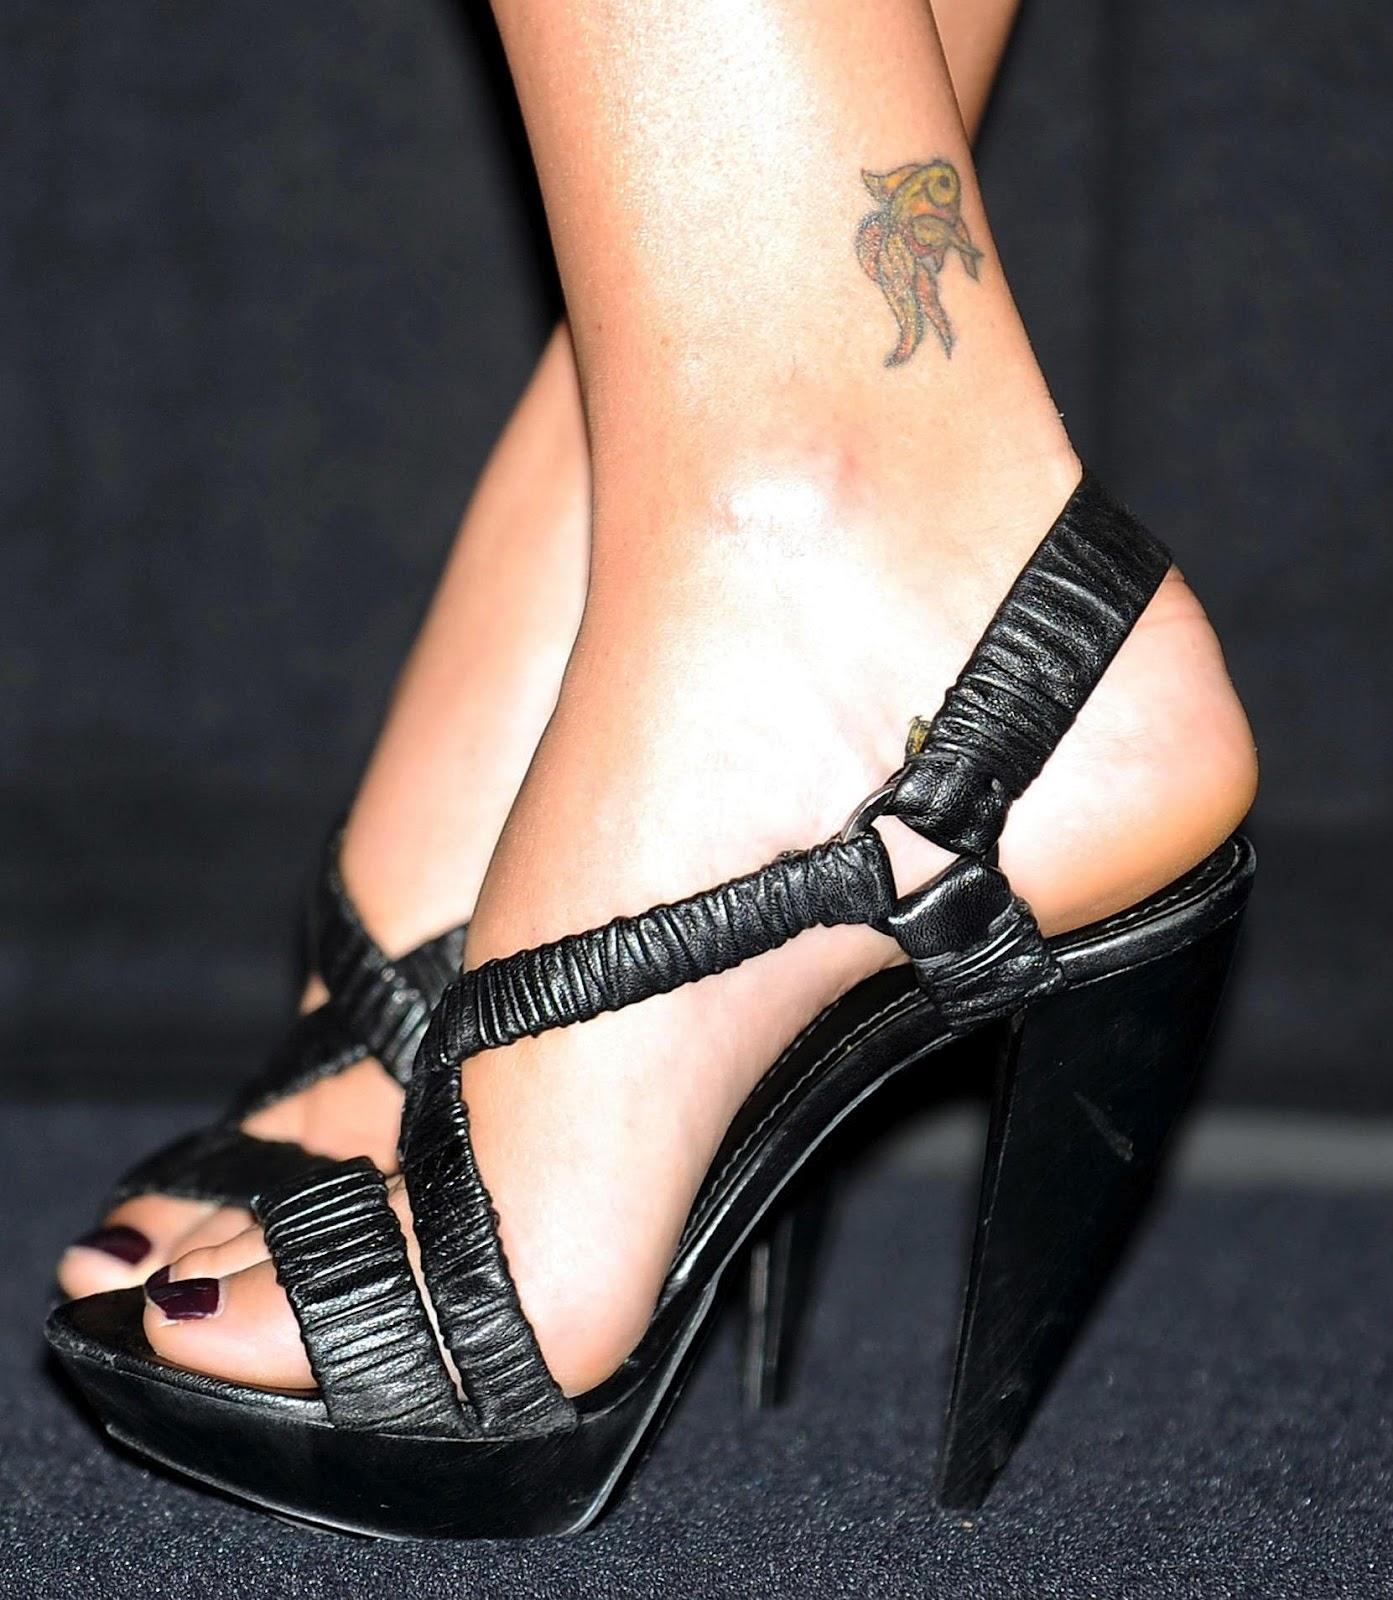 http://3.bp.blogspot.com/-C0peCUJYYuk/TzLmS5vo0KI/AAAAAAAADUw/KoV8HnuuY7g/s1600/charlize-theron_tattoo_04.jpg